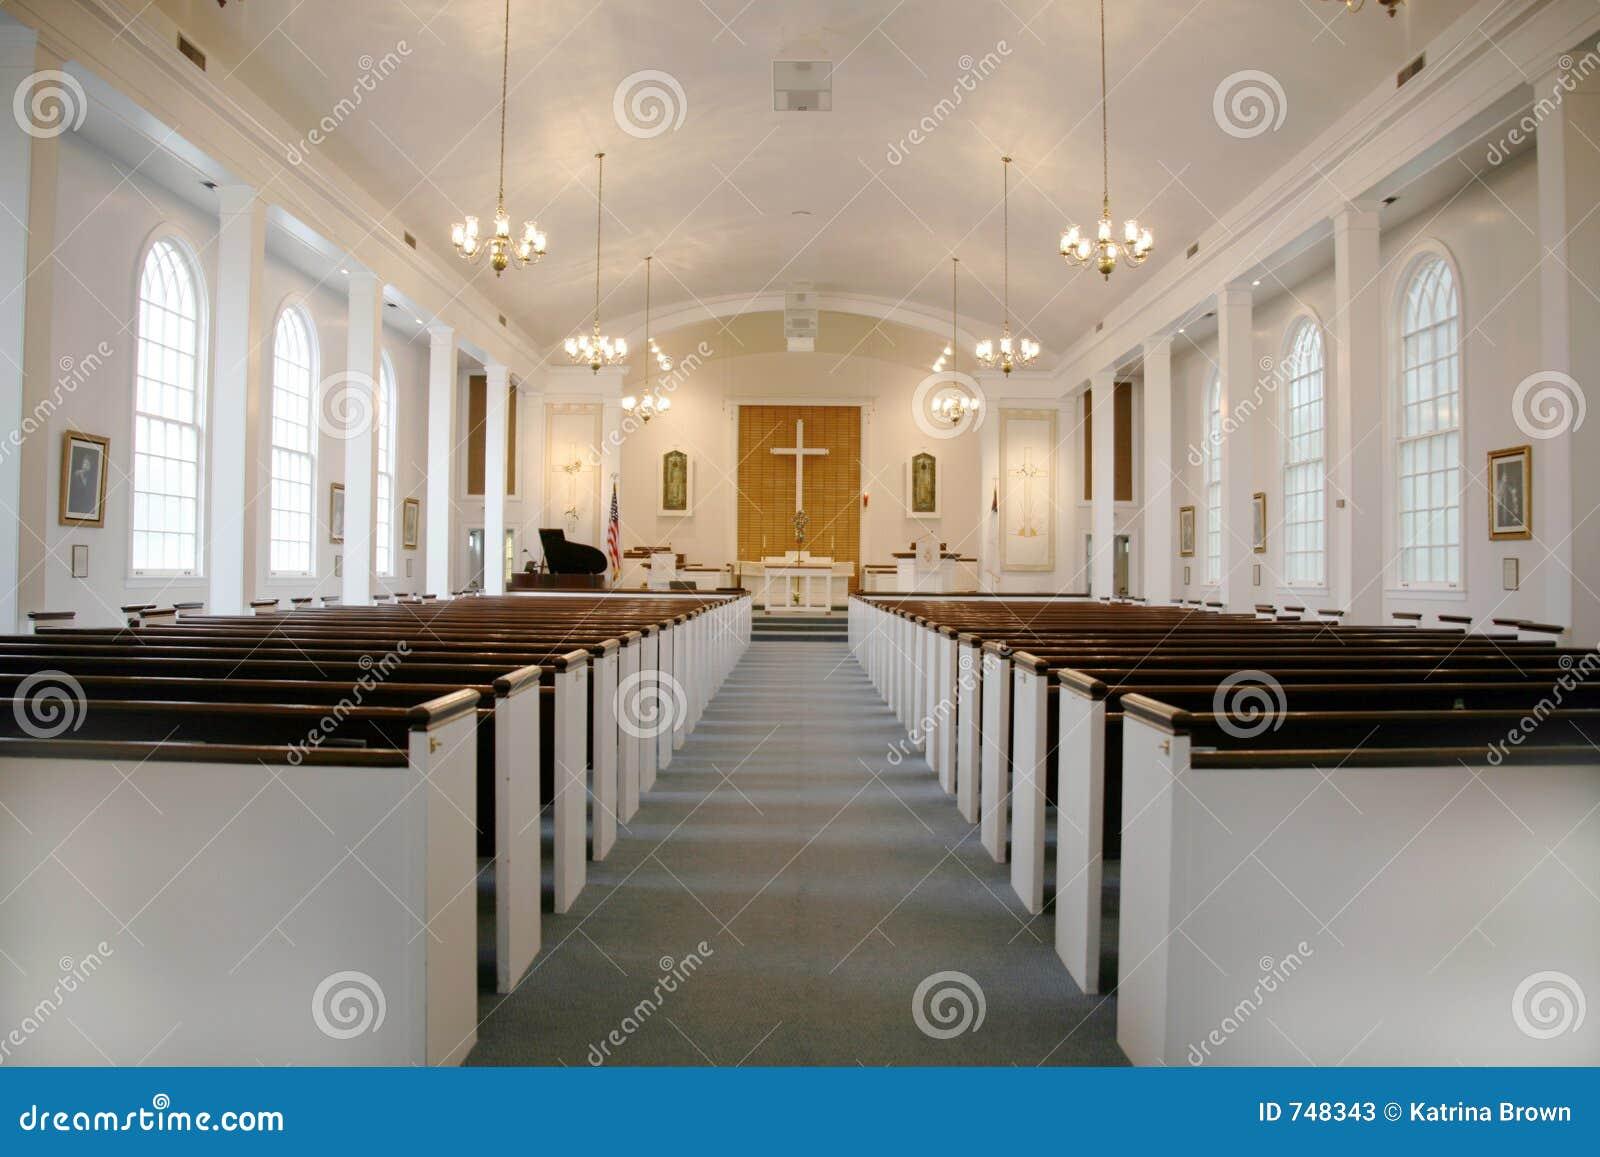 Iglesia cristiana de interior con las luces